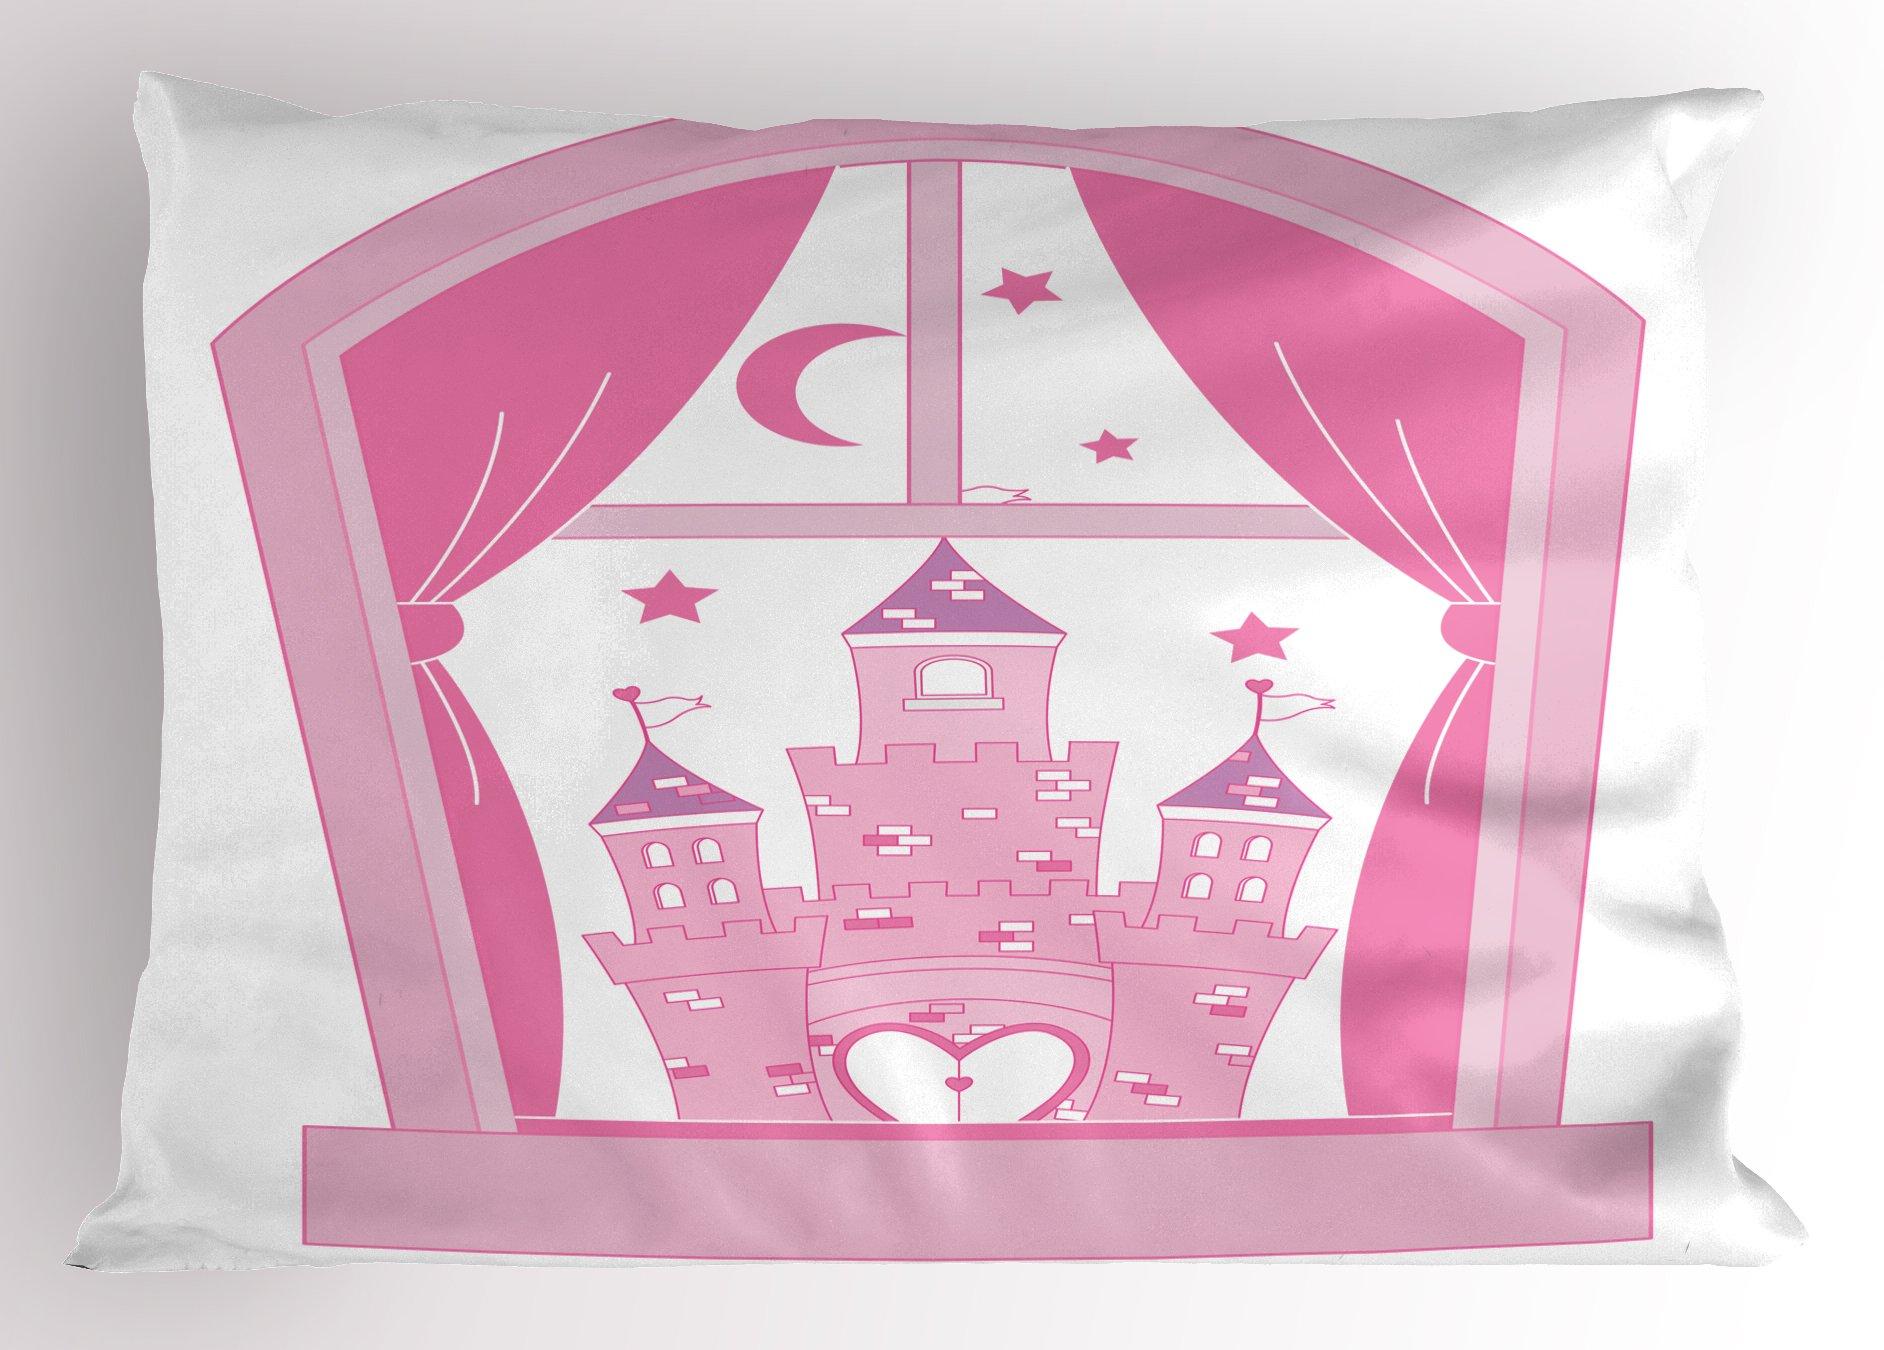 Ambesonne Princess Pillow Sham, Princess Castle Night Sky Stars Moon Palace Royalty Love Window Cartoon Print, Decorative Standard Size Printed Pillowcase, 26 X 20 inches, Pink Rose White